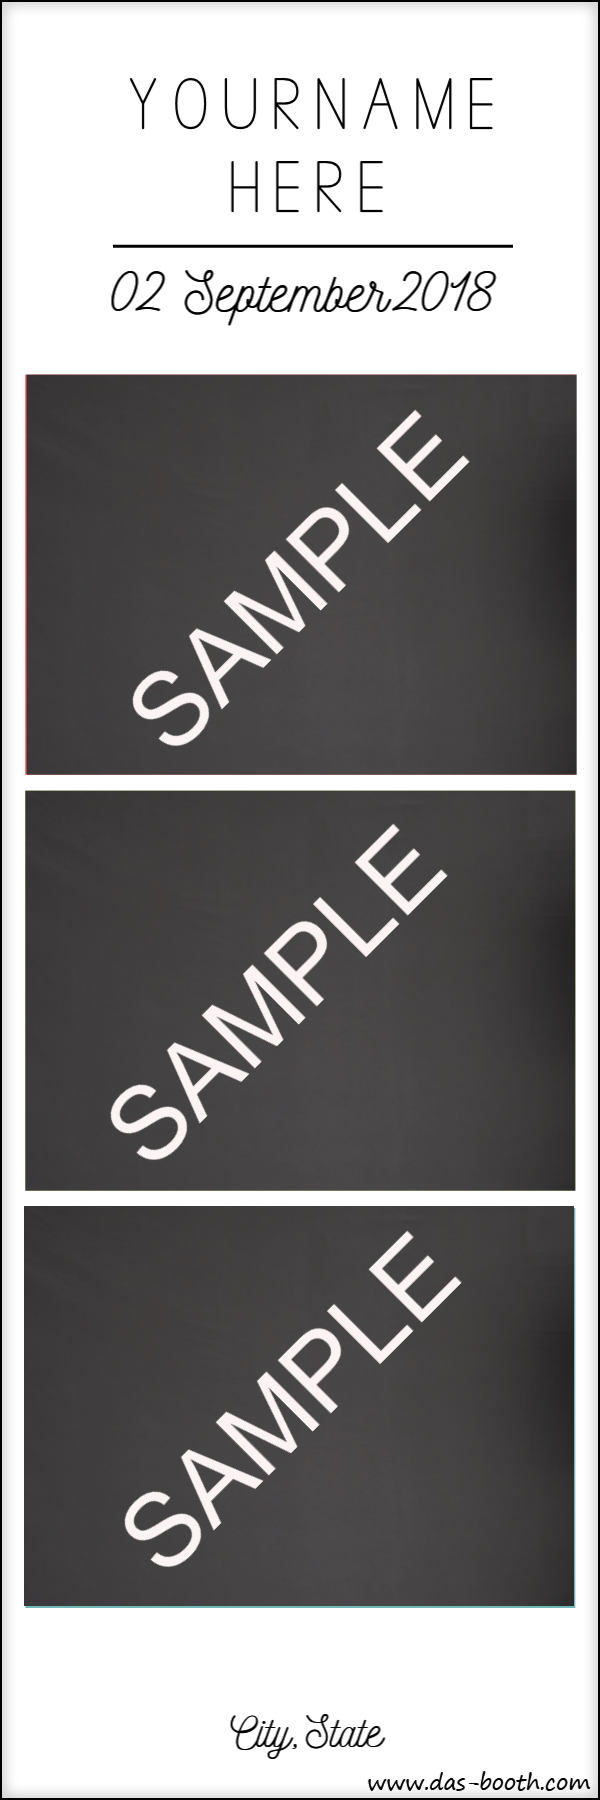 3 photos - vertical - sample5.png